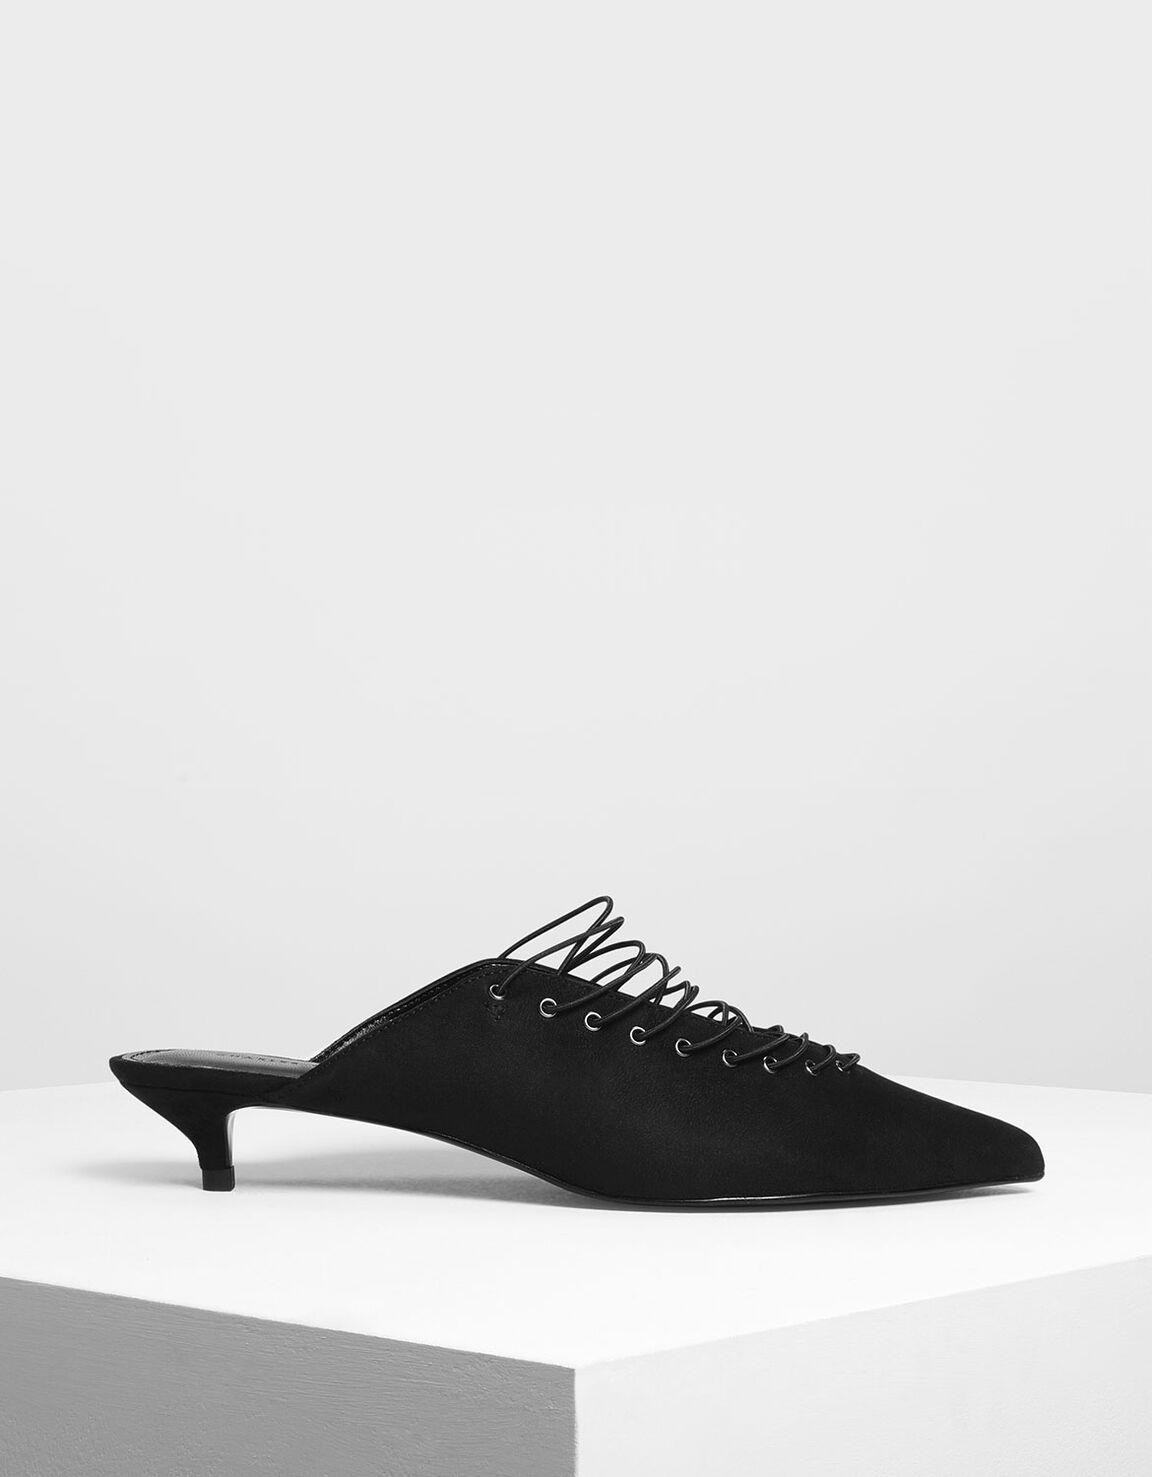 CHARLES & KEITH 鞋款低至34折優惠!:第5張圖片